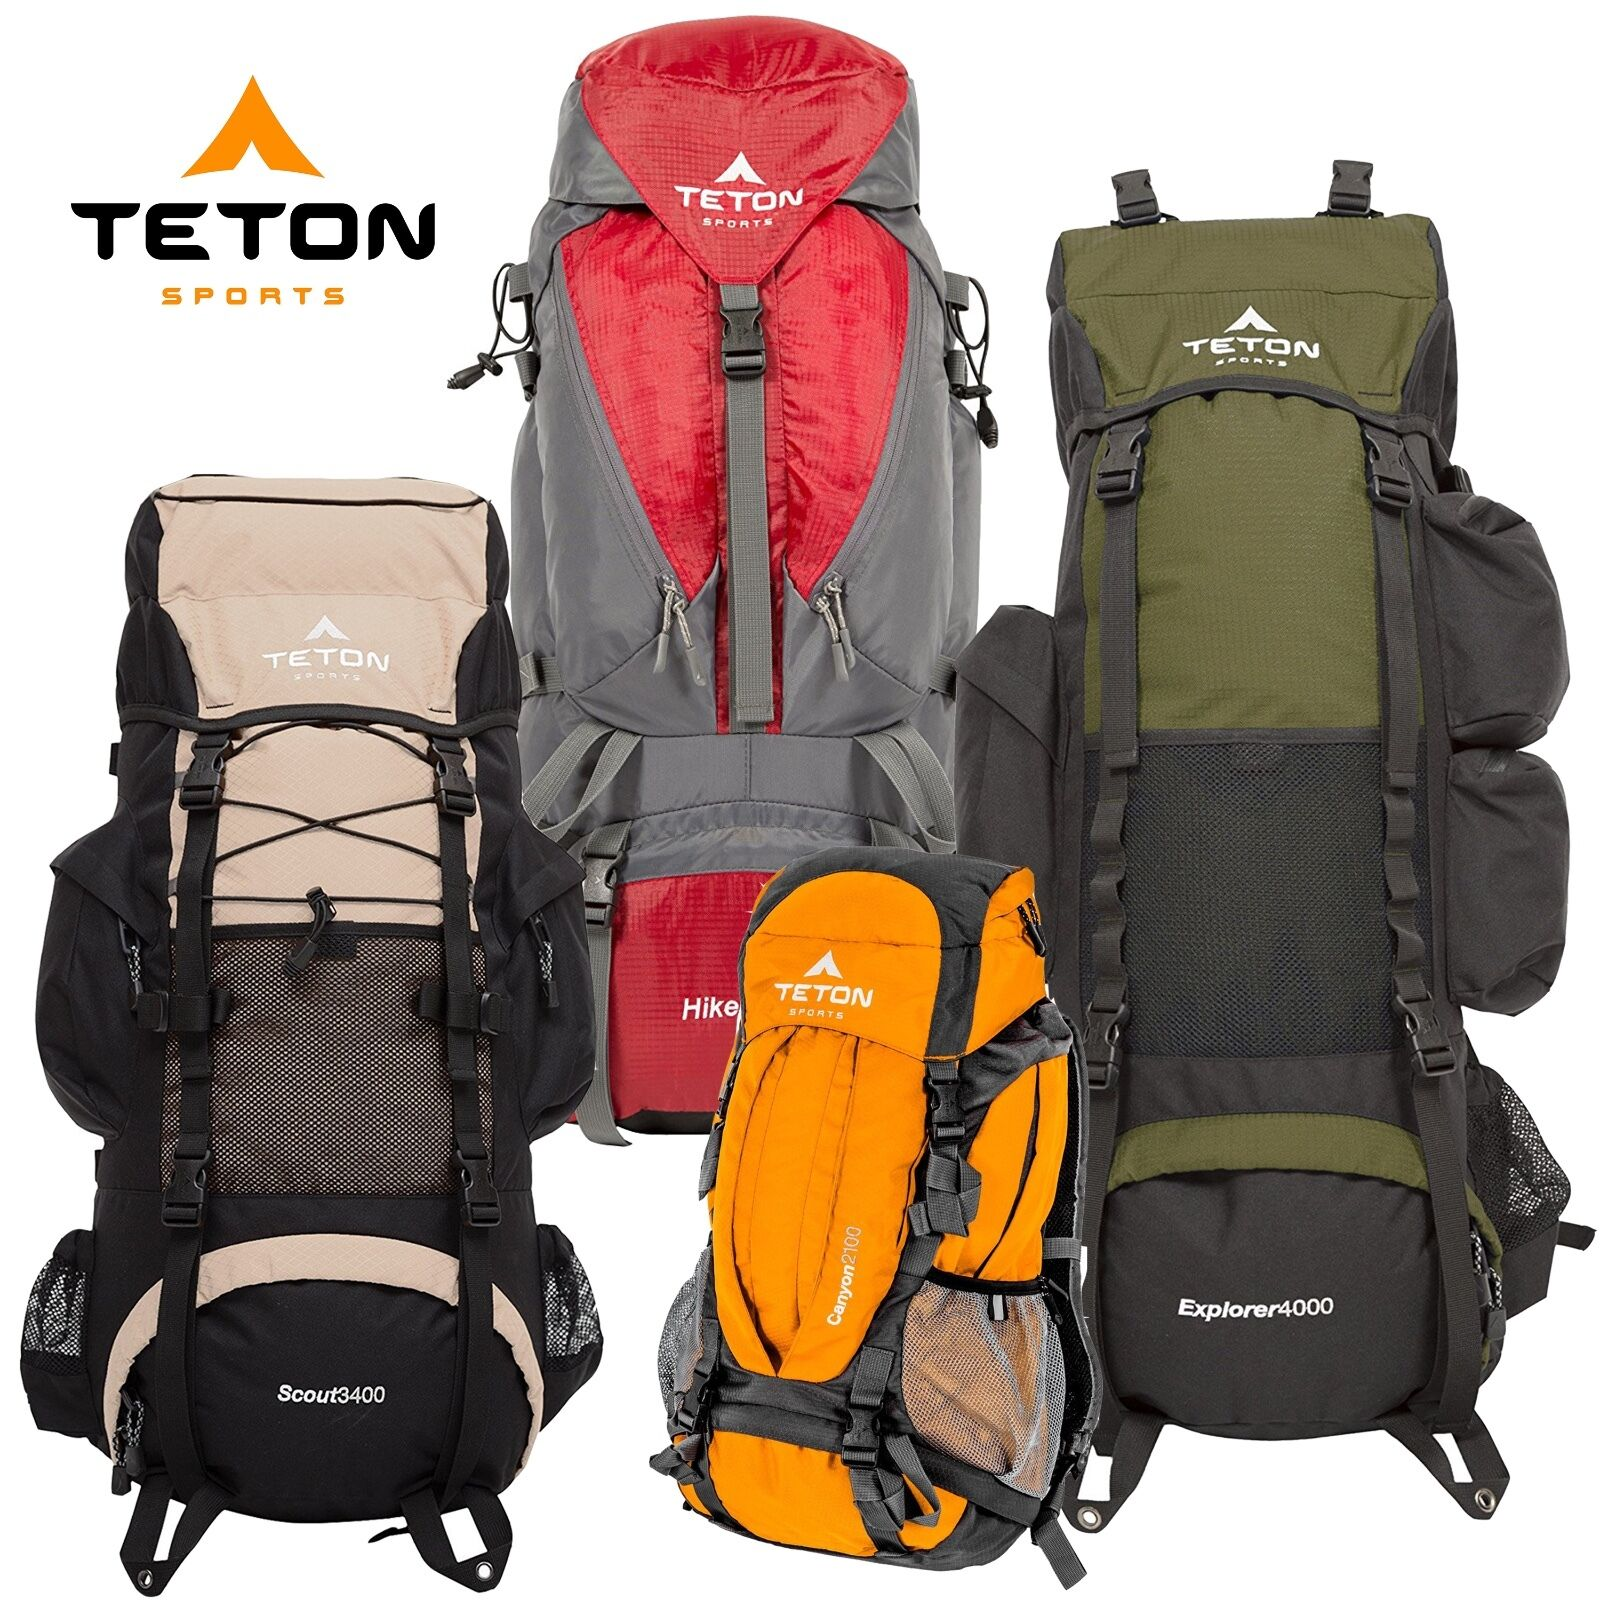 Teton Sports Summit 1500 Ultralight Internal Frame Backpack 54010025 ...